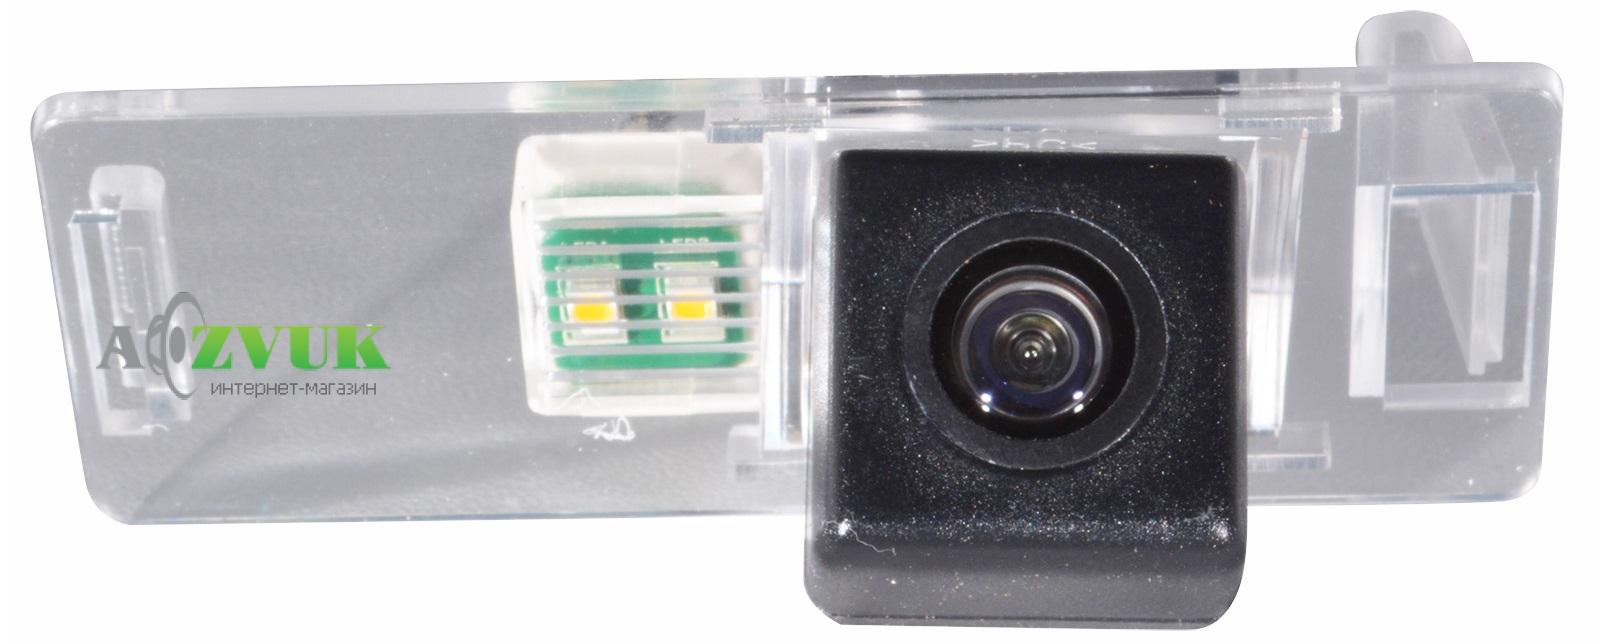 камеры видеонаблюдения заднего вида на авео т300 продаже квартир